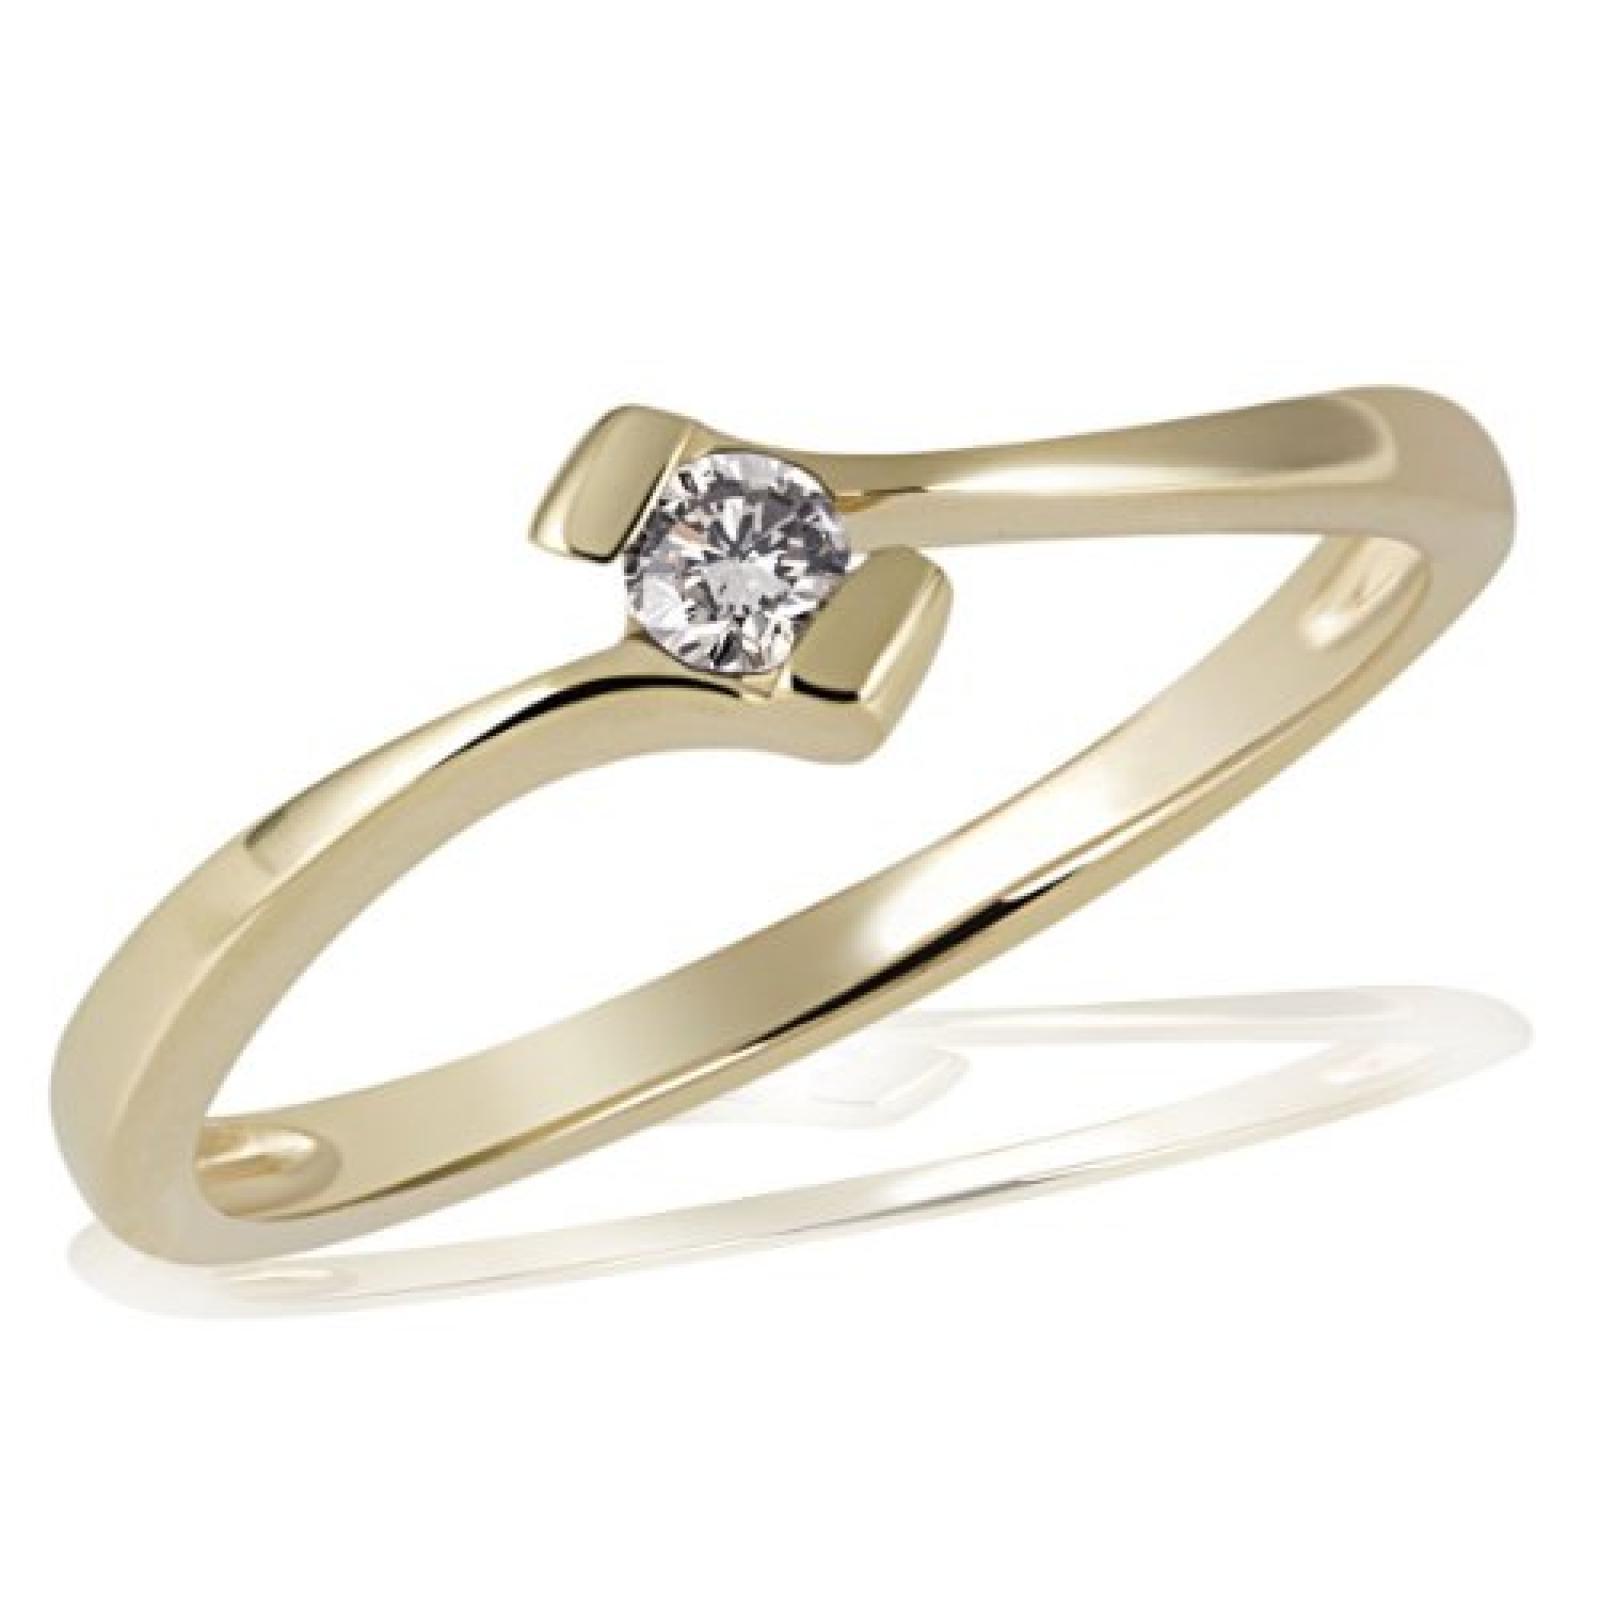 Goldmaid Damen-Ring 18 Karat 750 Gelbgold Verlobung Solitär 1 Brillant 0,10 ct. So R3925GG750